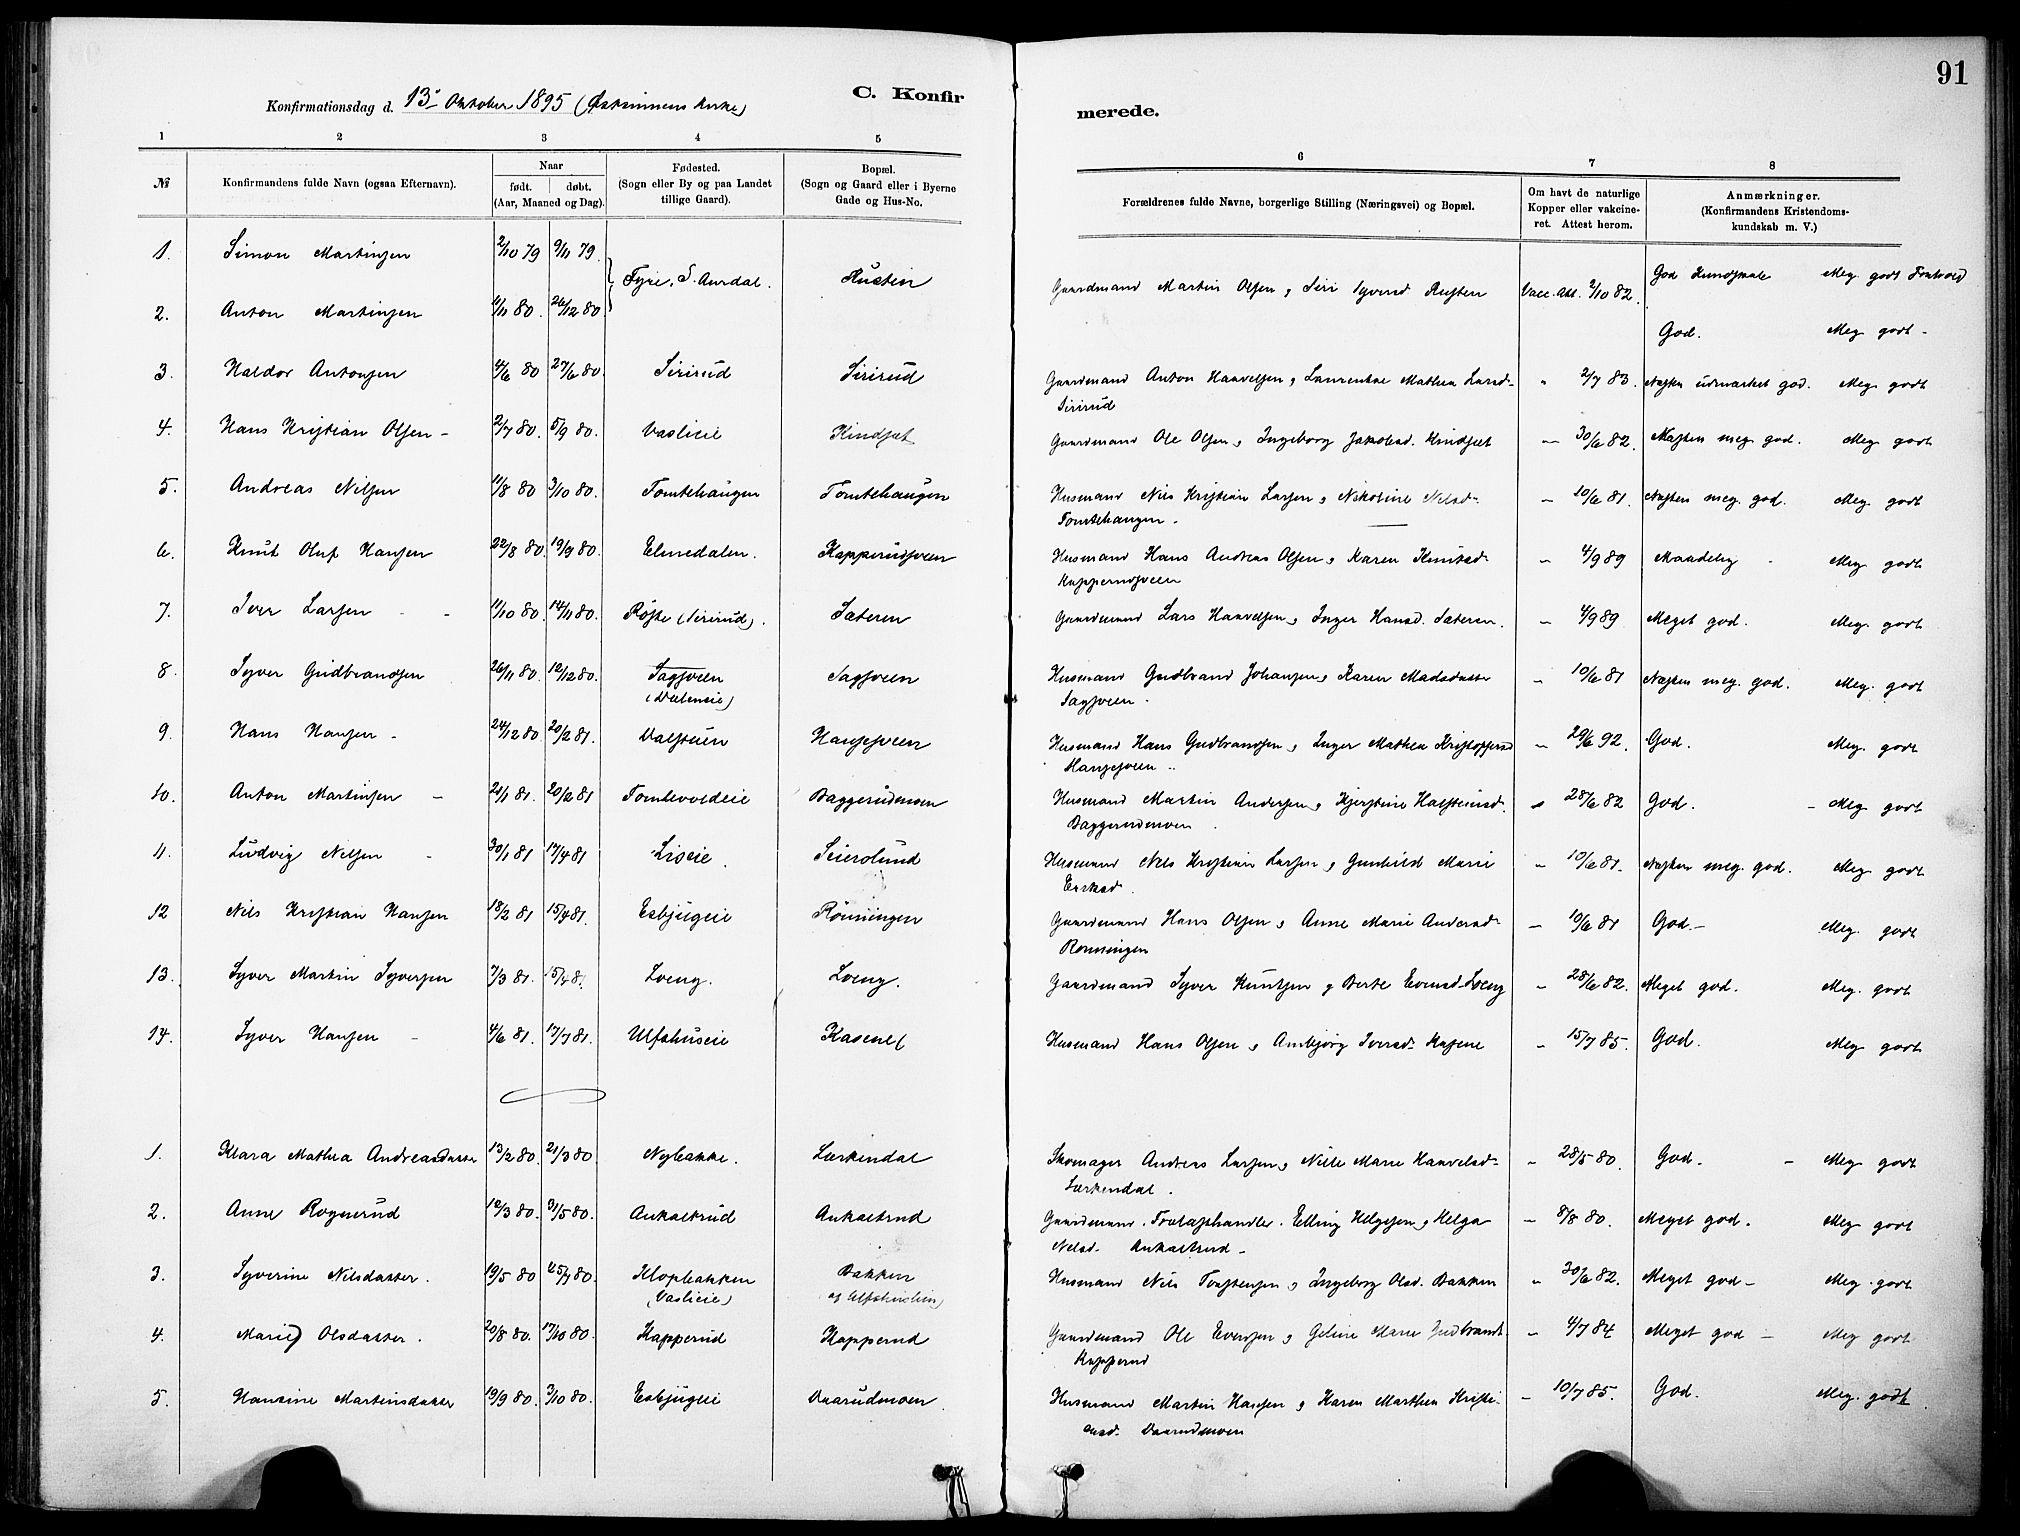 SAH, Nordre Land prestekontor, Ministerialbok nr. 5, 1882-1903, s. 91